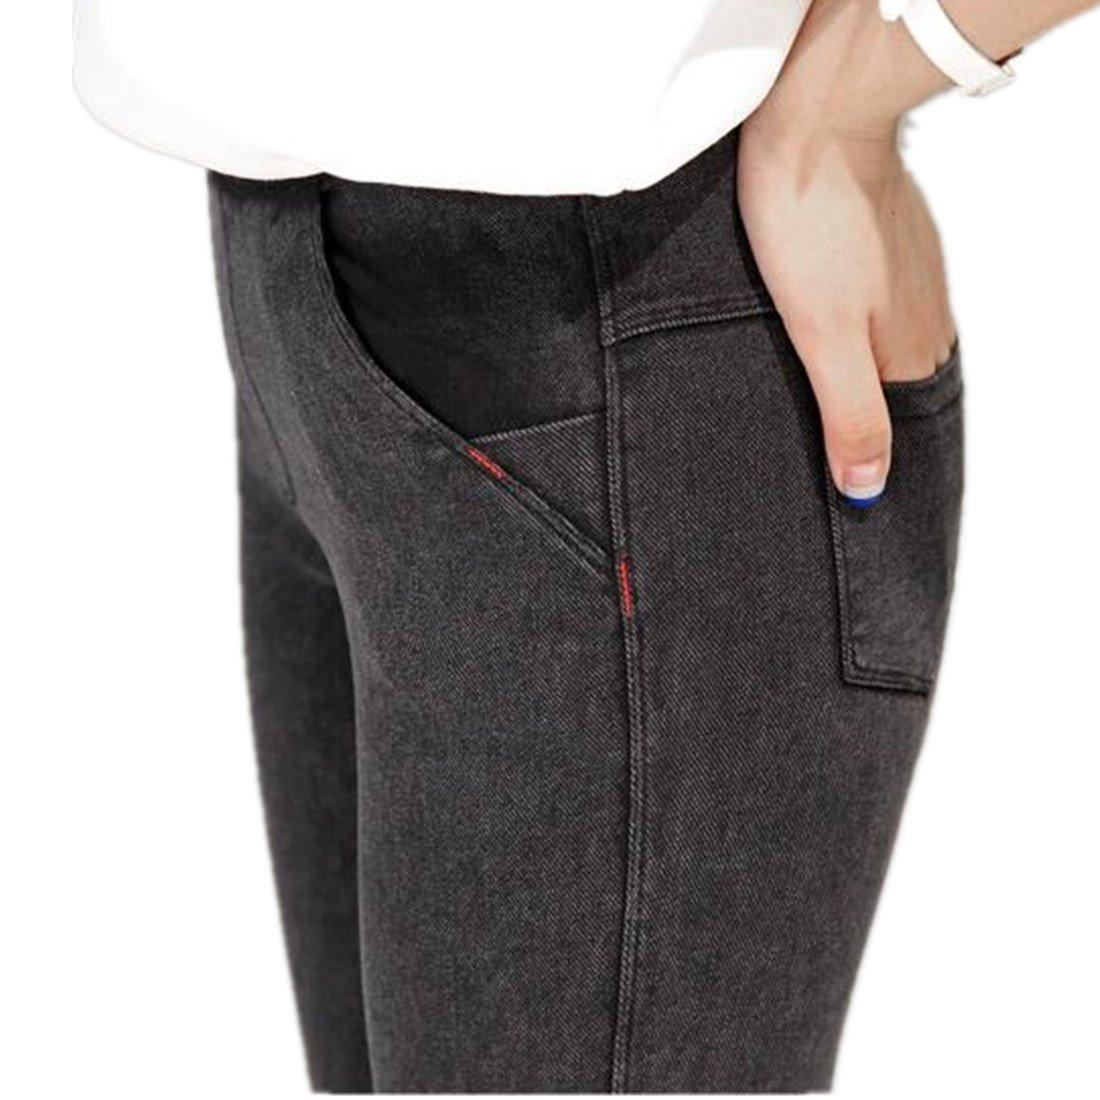 ForeMode Women Skinny Denim Leggings Elastics waist and pockets tight strech jean